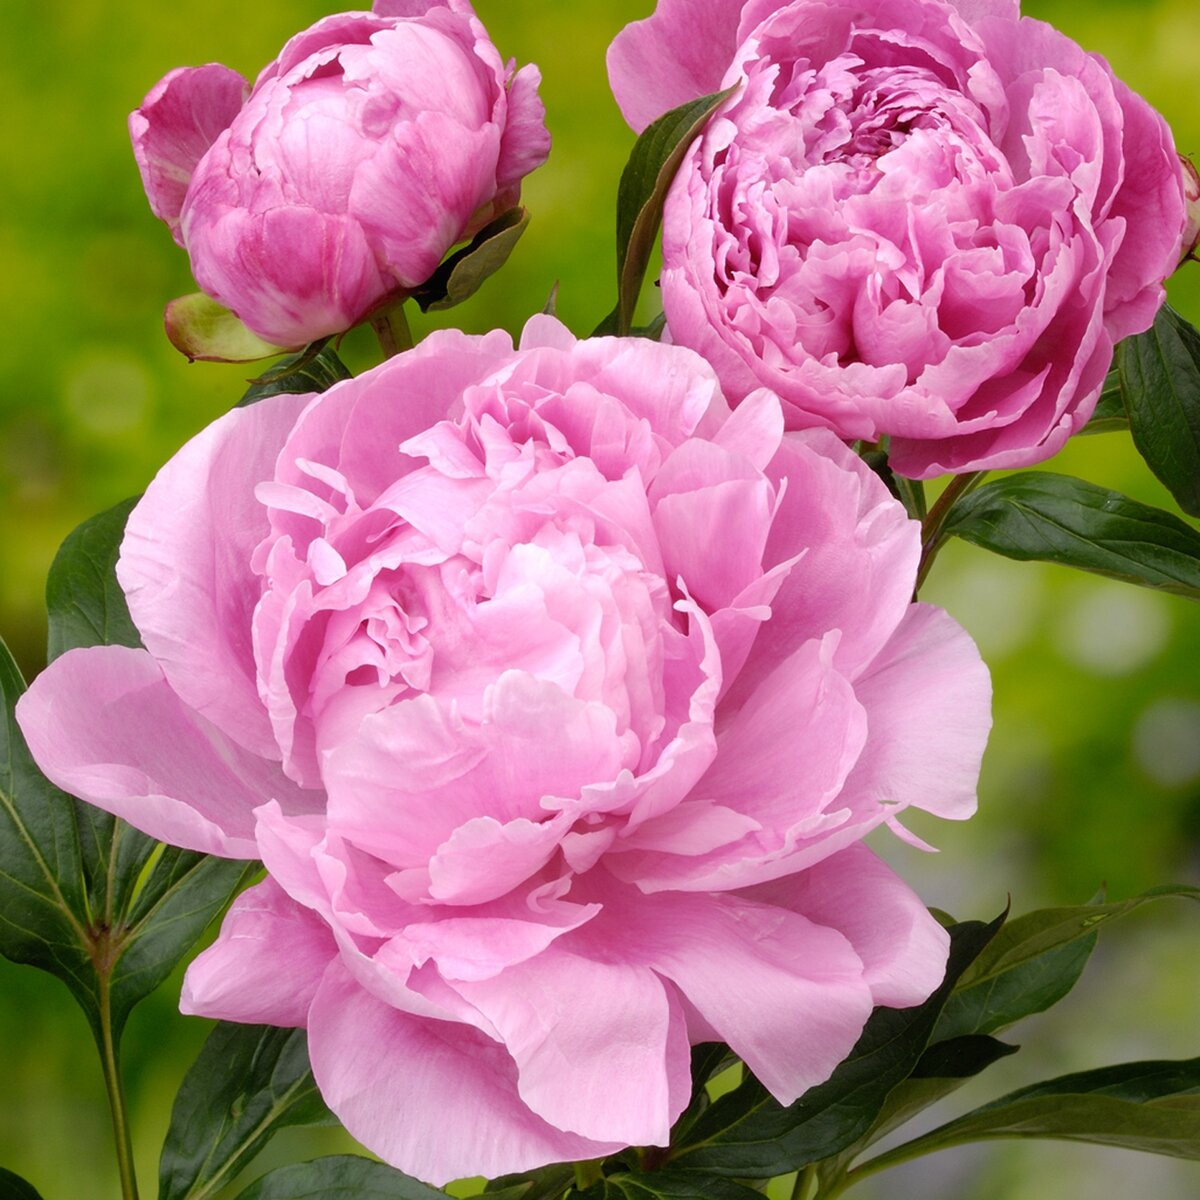 Красивый цветок пион картинка